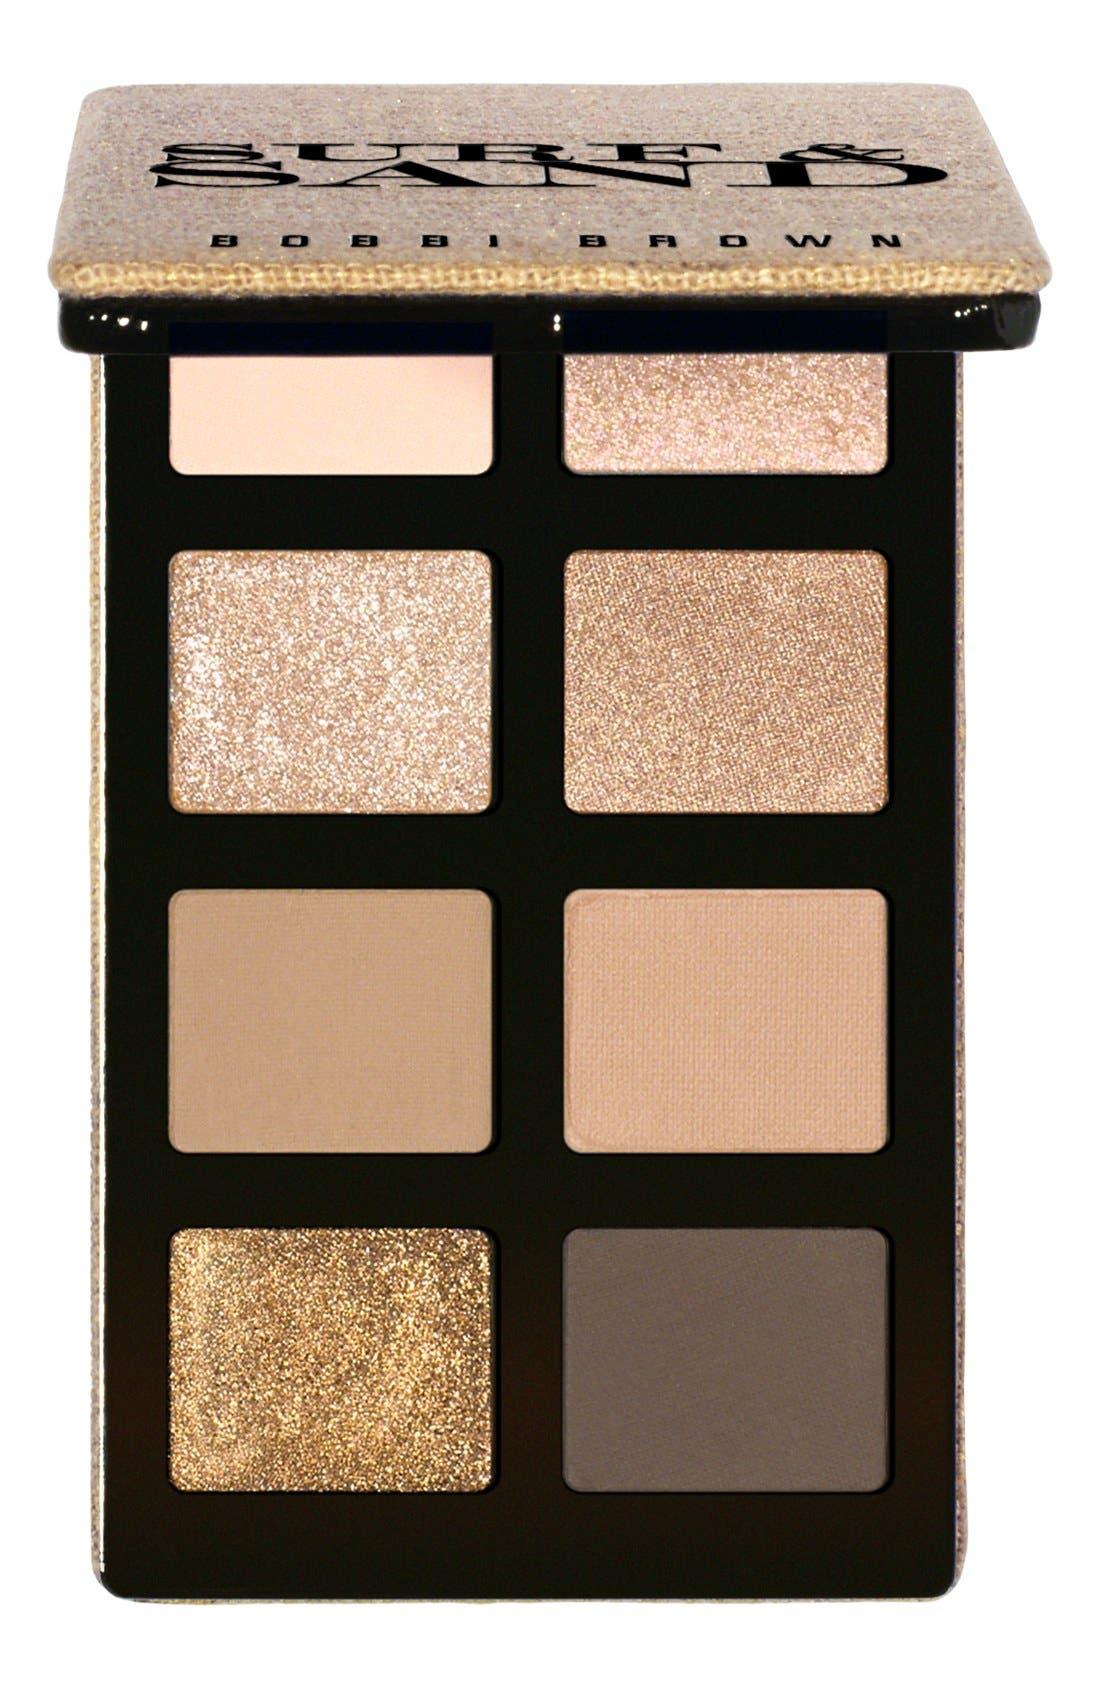 BOBBI BROWN 'Surf & Sand - Sand' Eyeshadow Palette, Main, color, 250